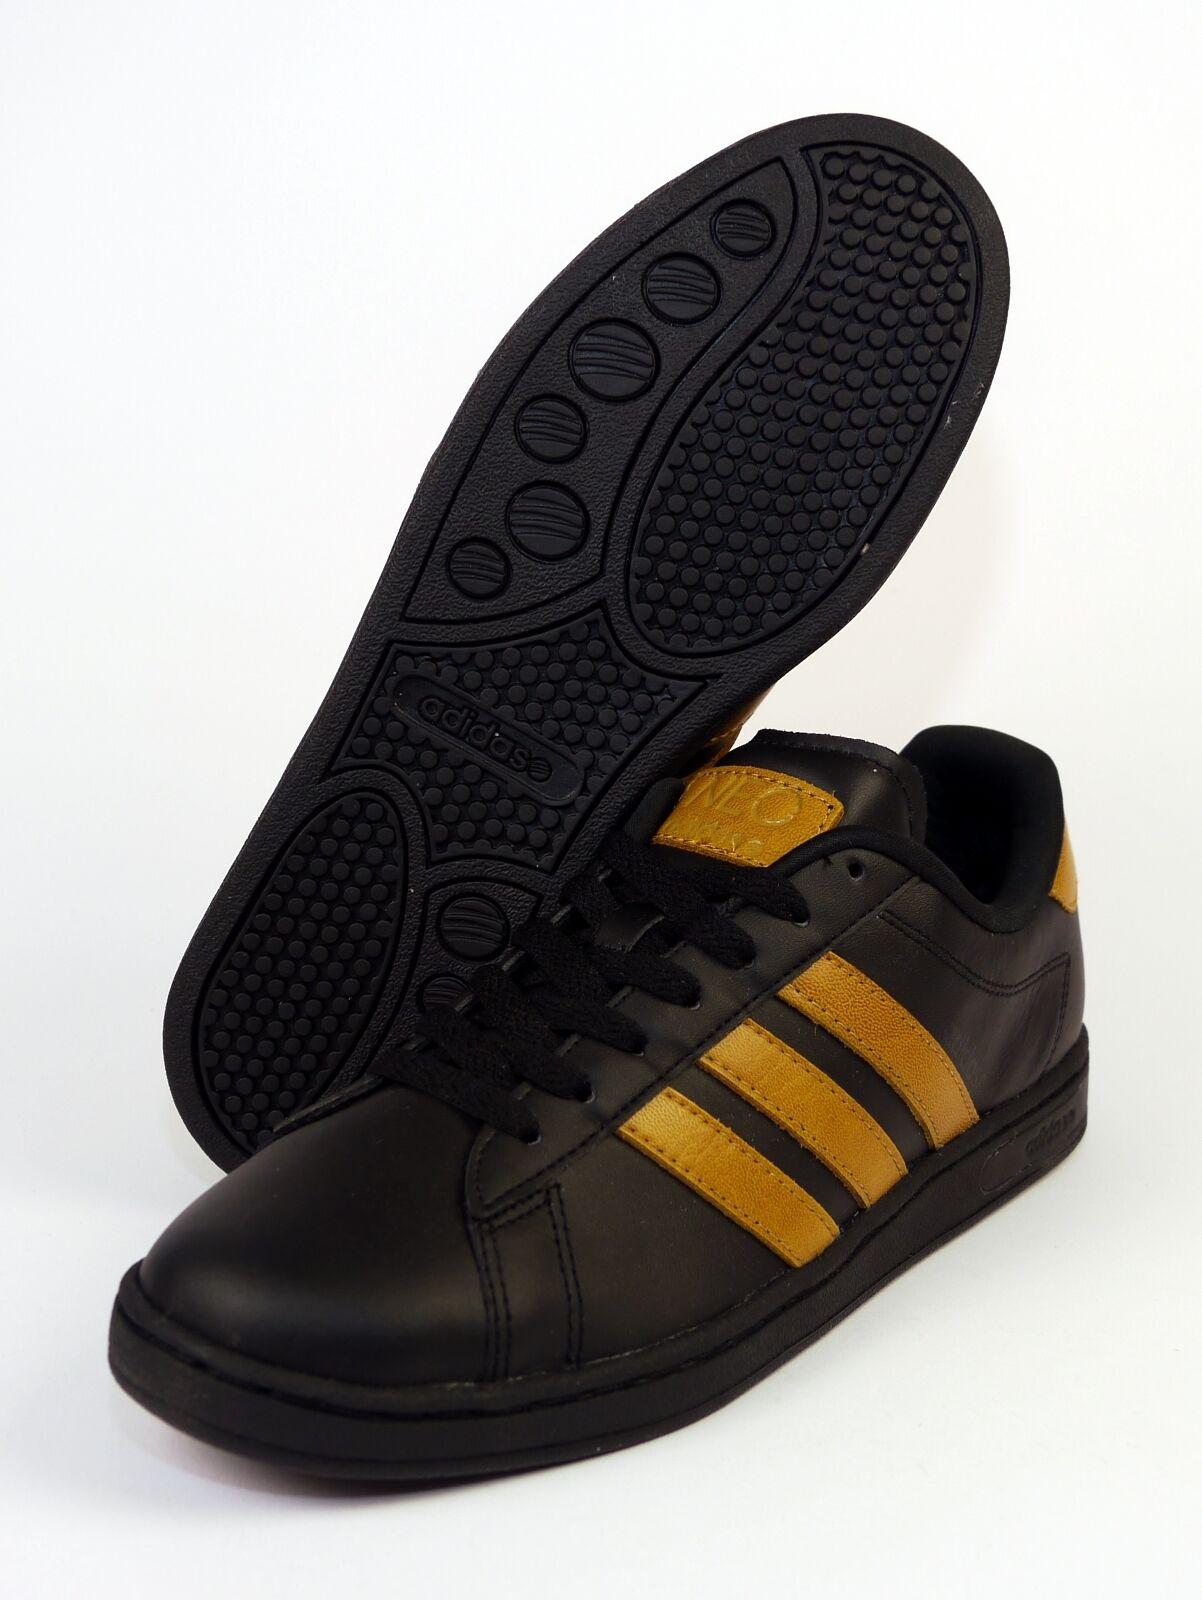 adidas neo derby ii, ii, ii, cuir cuir le cmon baskets formateurs af329d